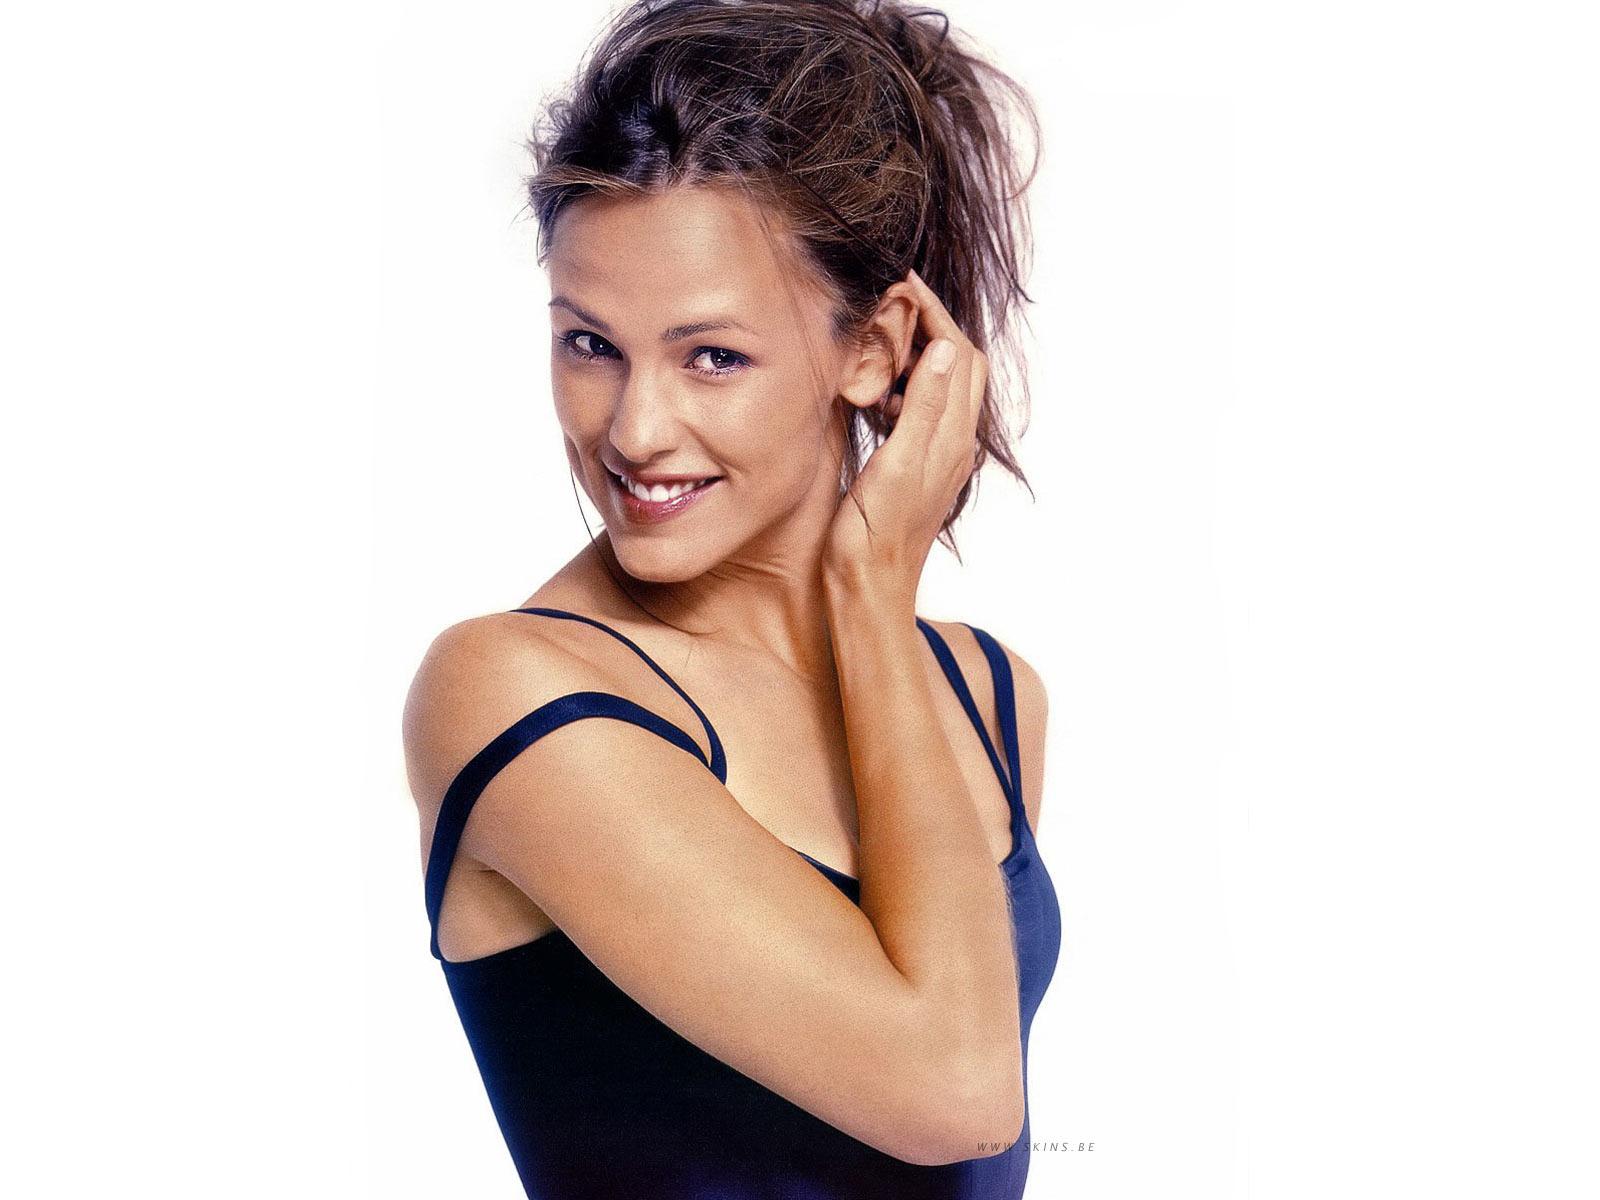 Free download Jennifer Garner HD Wallpaper Wallpaper High